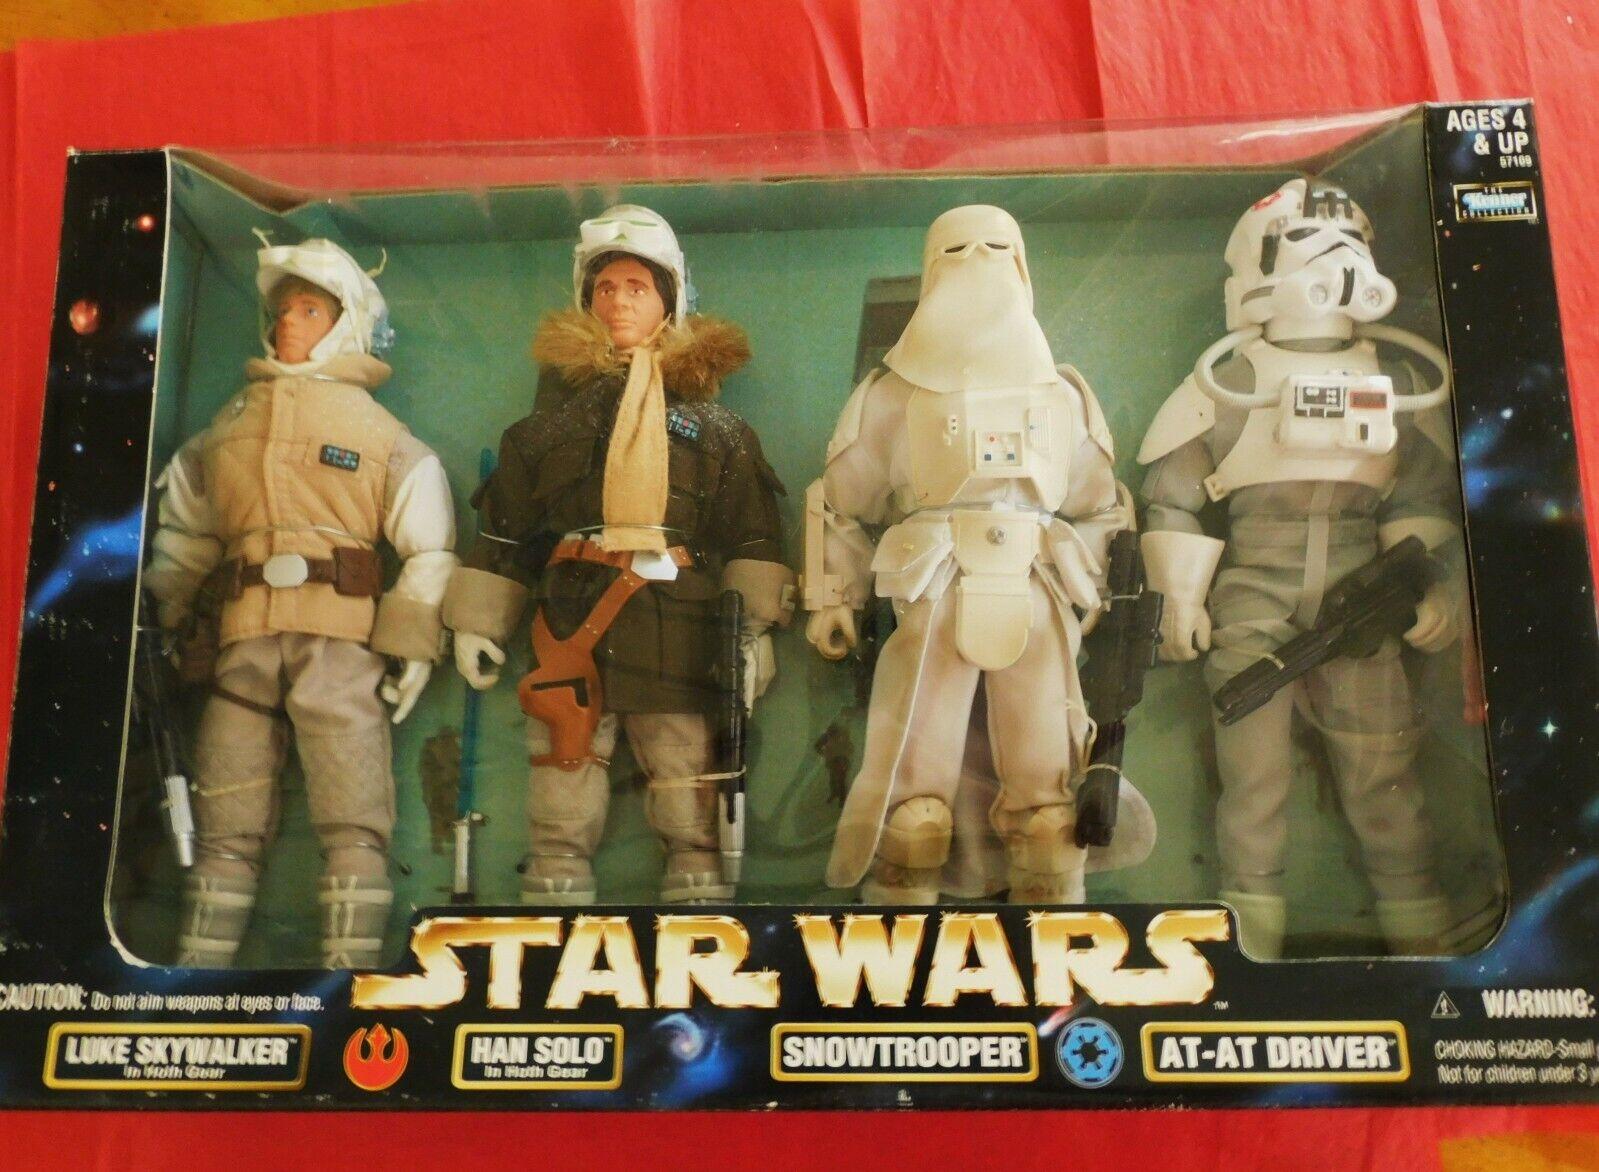 STAR WARS Figura Luke Skywalker nella Hoth Gear Action figure da KENNER NUOVO